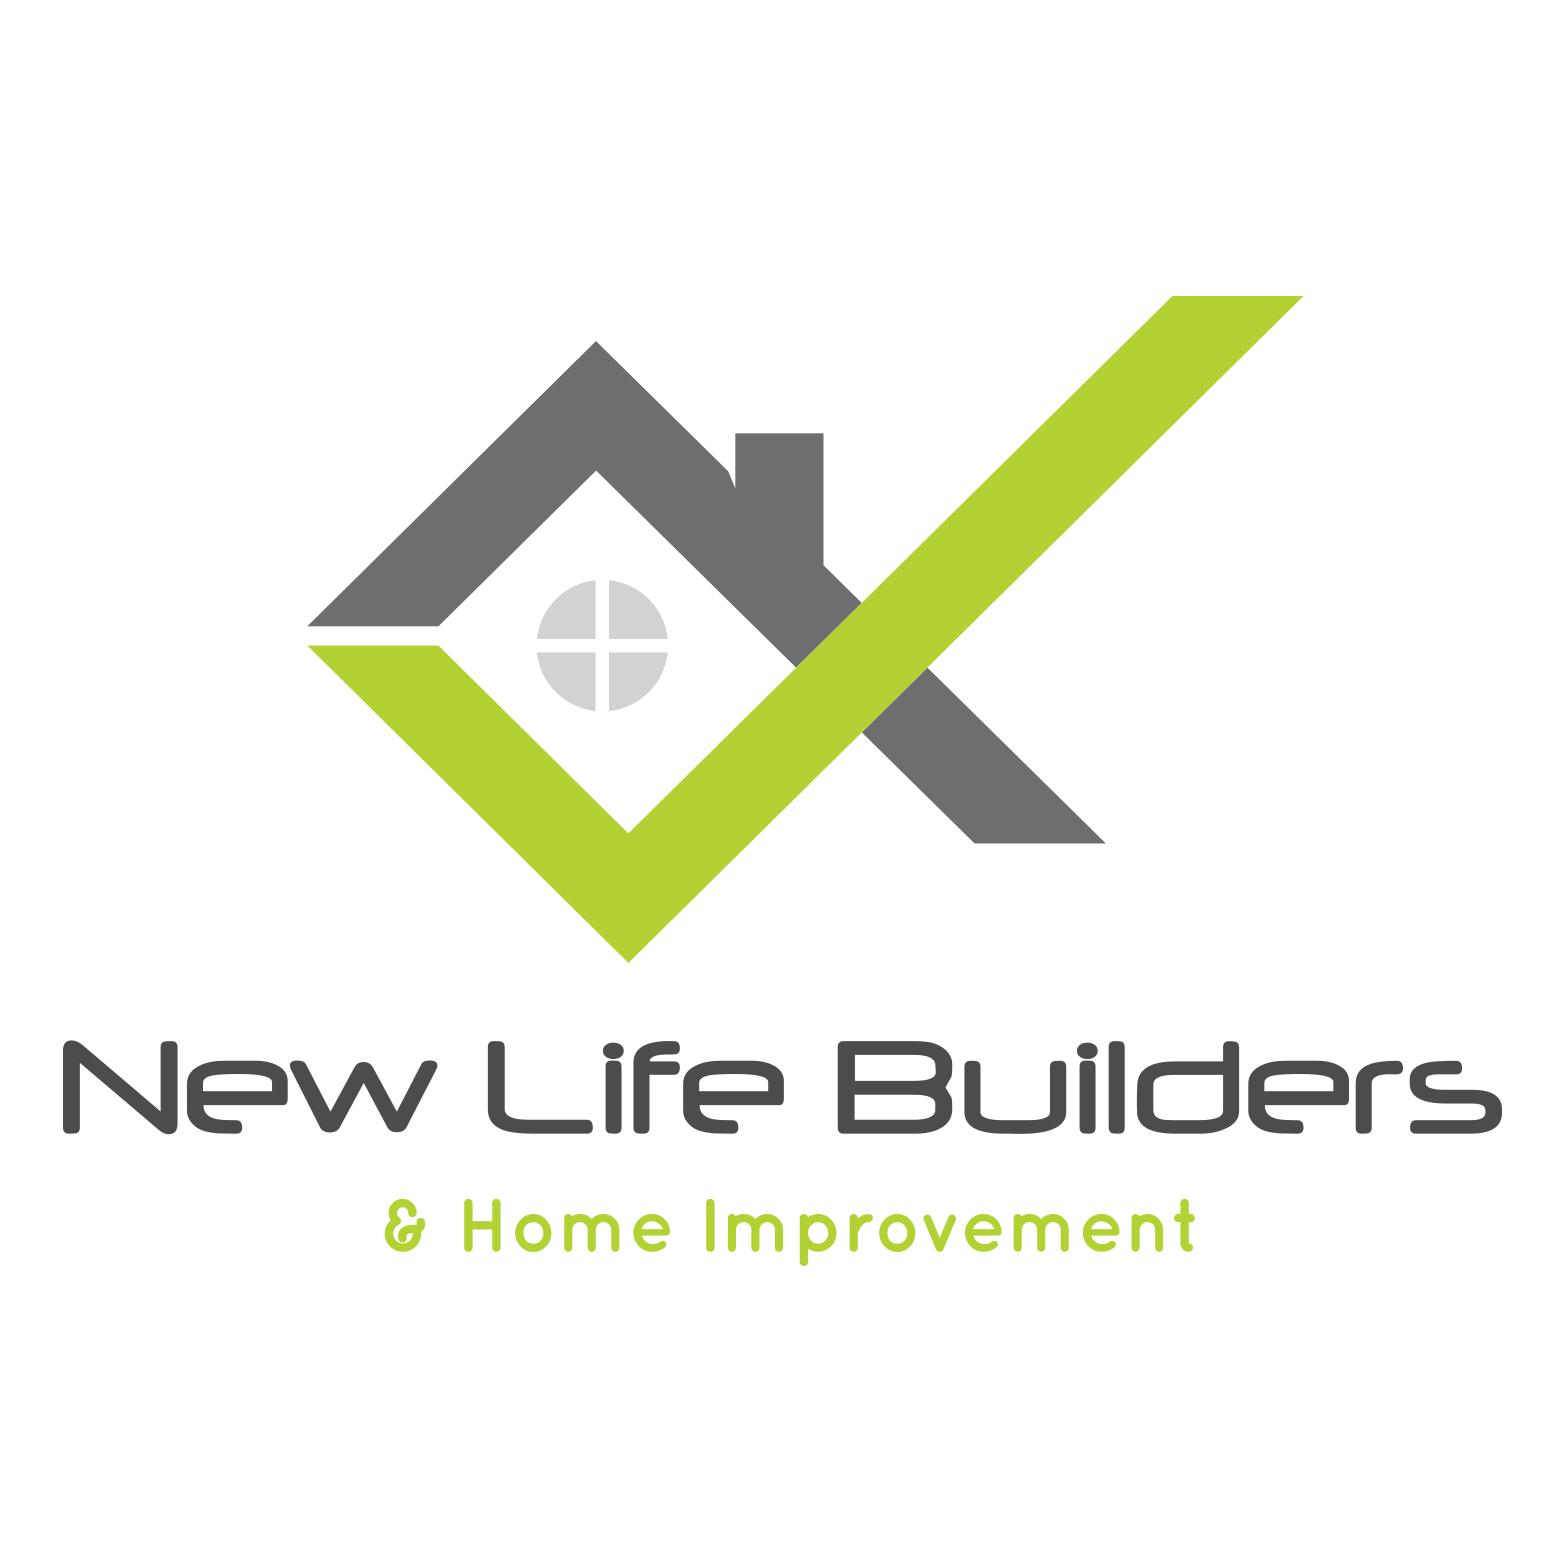 New Life Builders & Home Improvement LLC